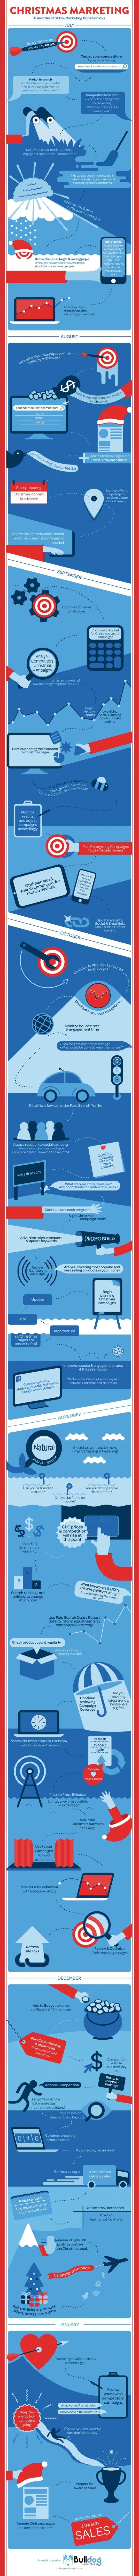 91 best Online Marketing Infographics images on Pinterest   Social ...